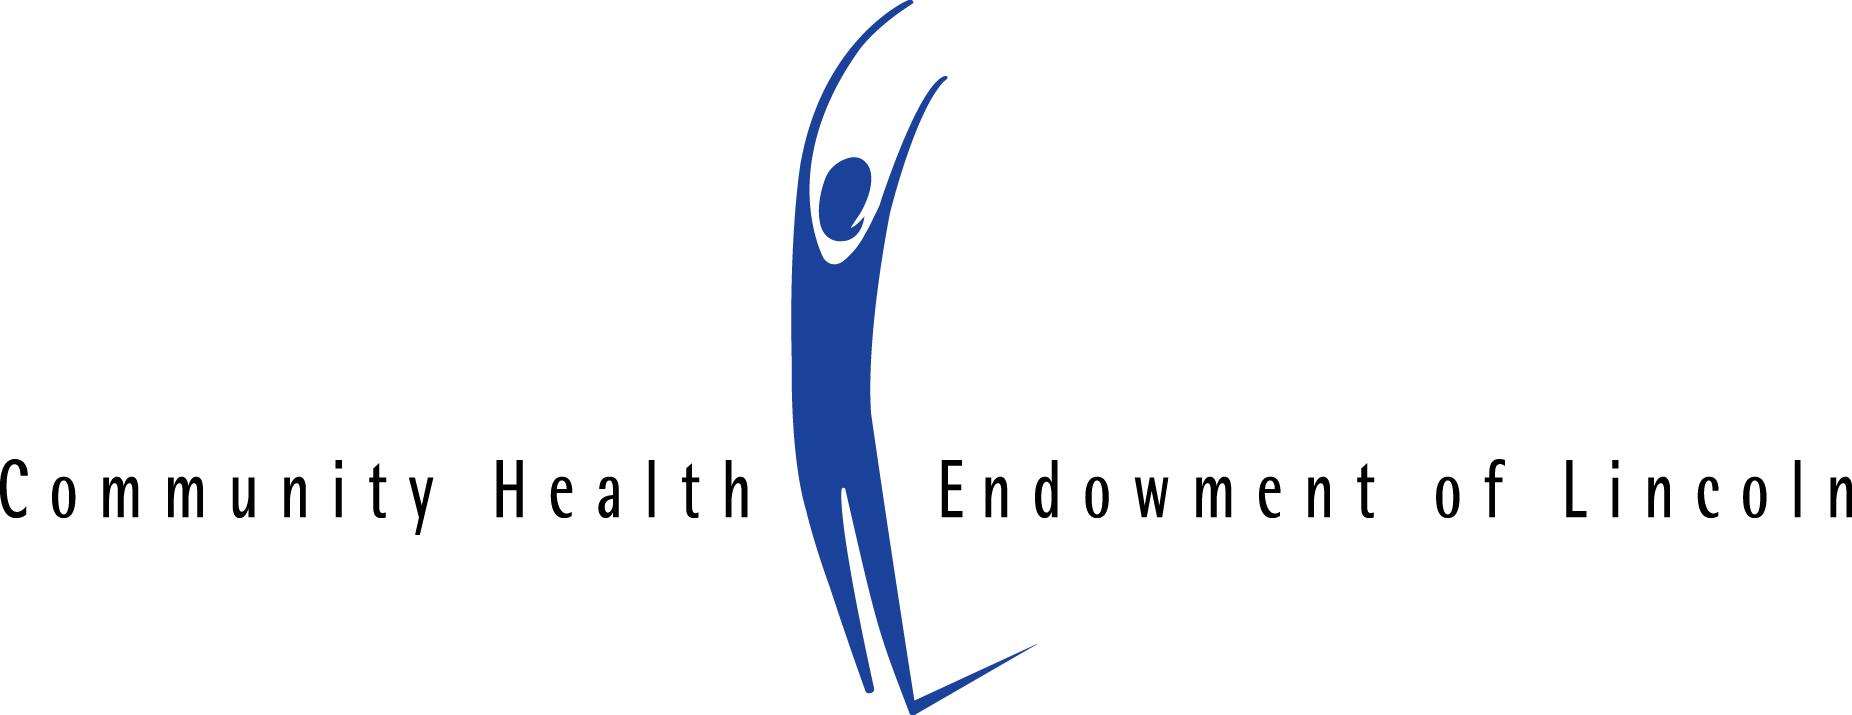 Community Health Endowment of Lincoln